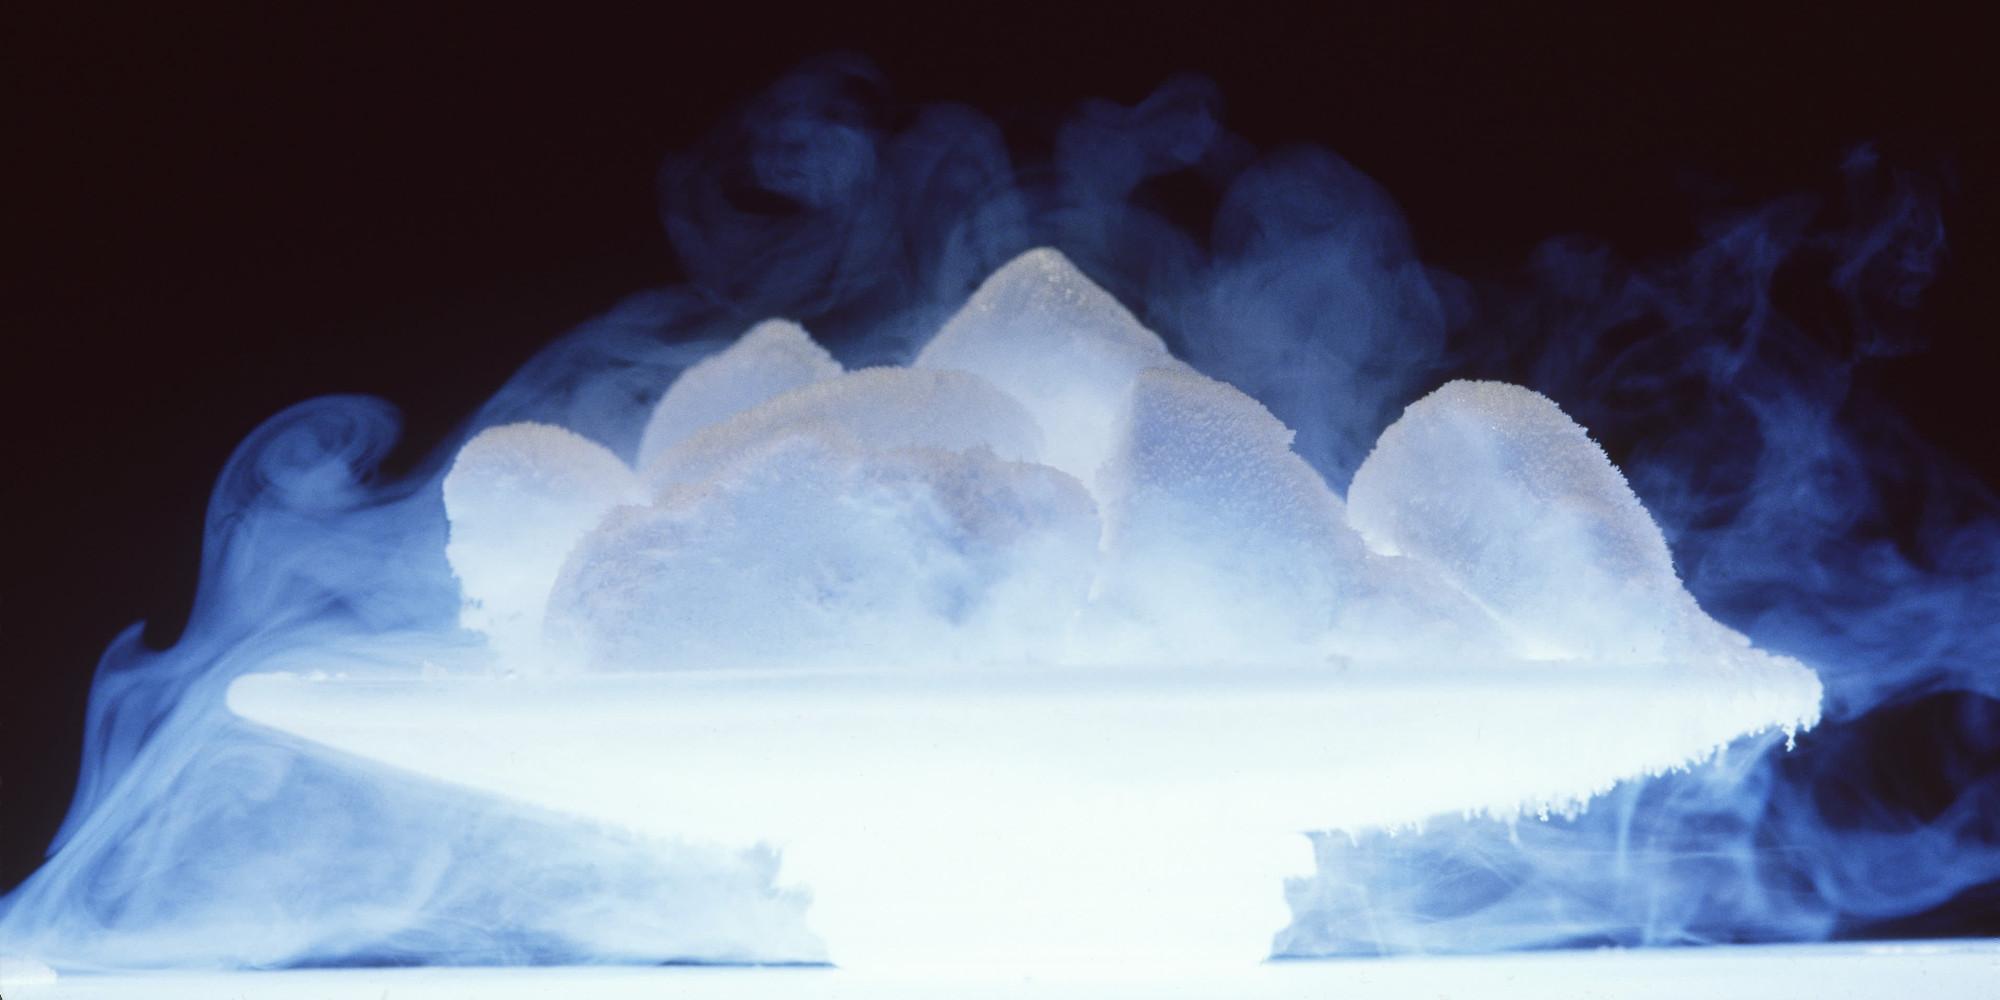 Картинка испарения льда